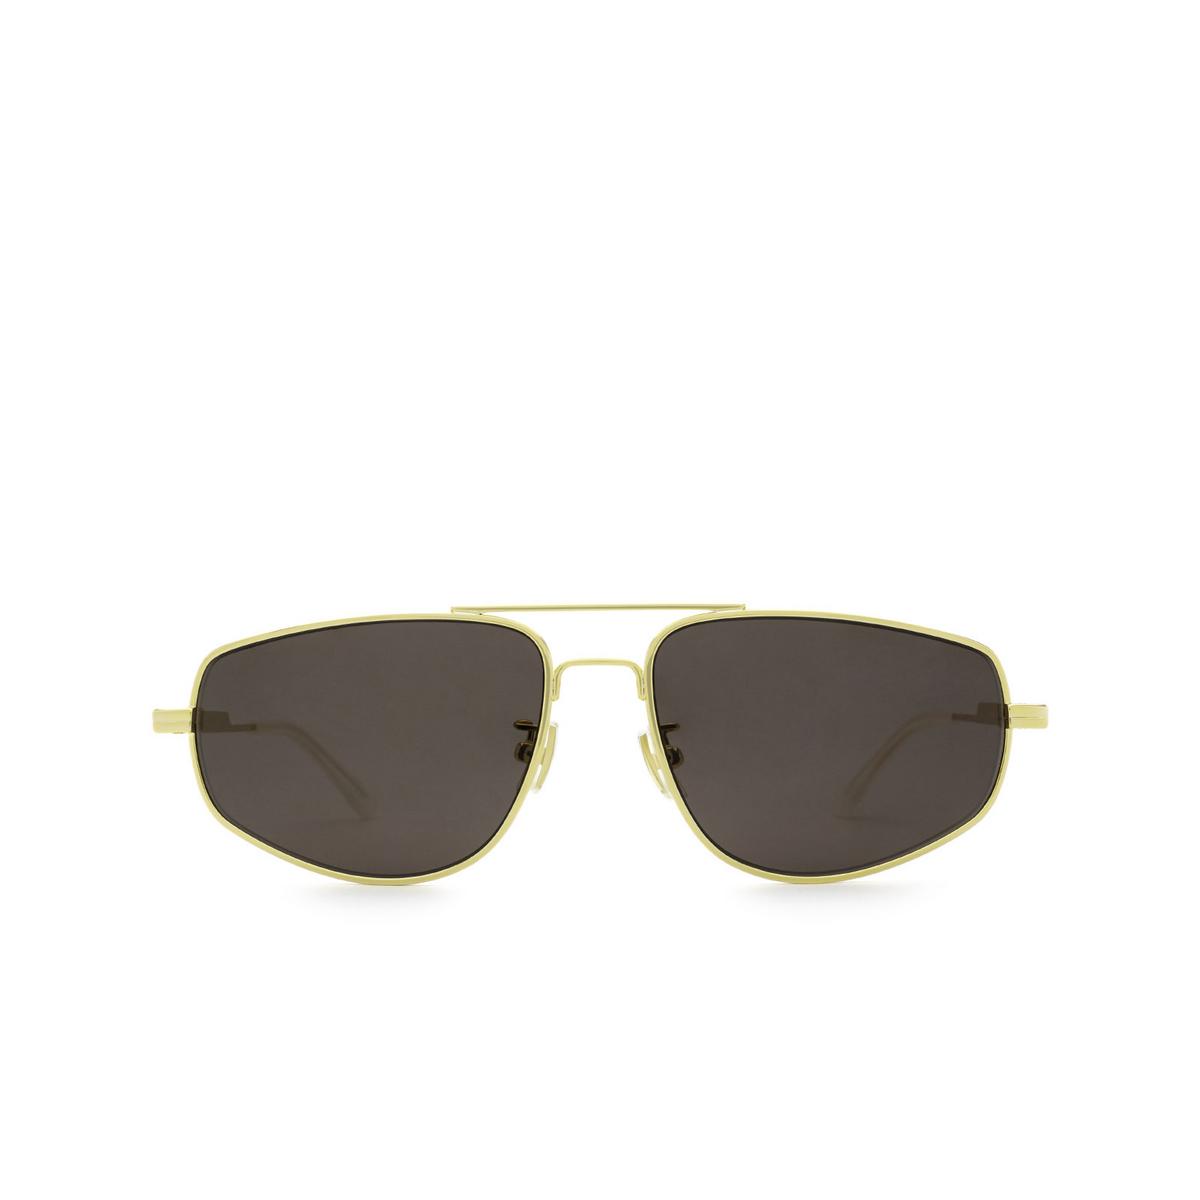 Bottega Veneta® Aviator Sunglasses: BV1125S color Gold 002 - front view.